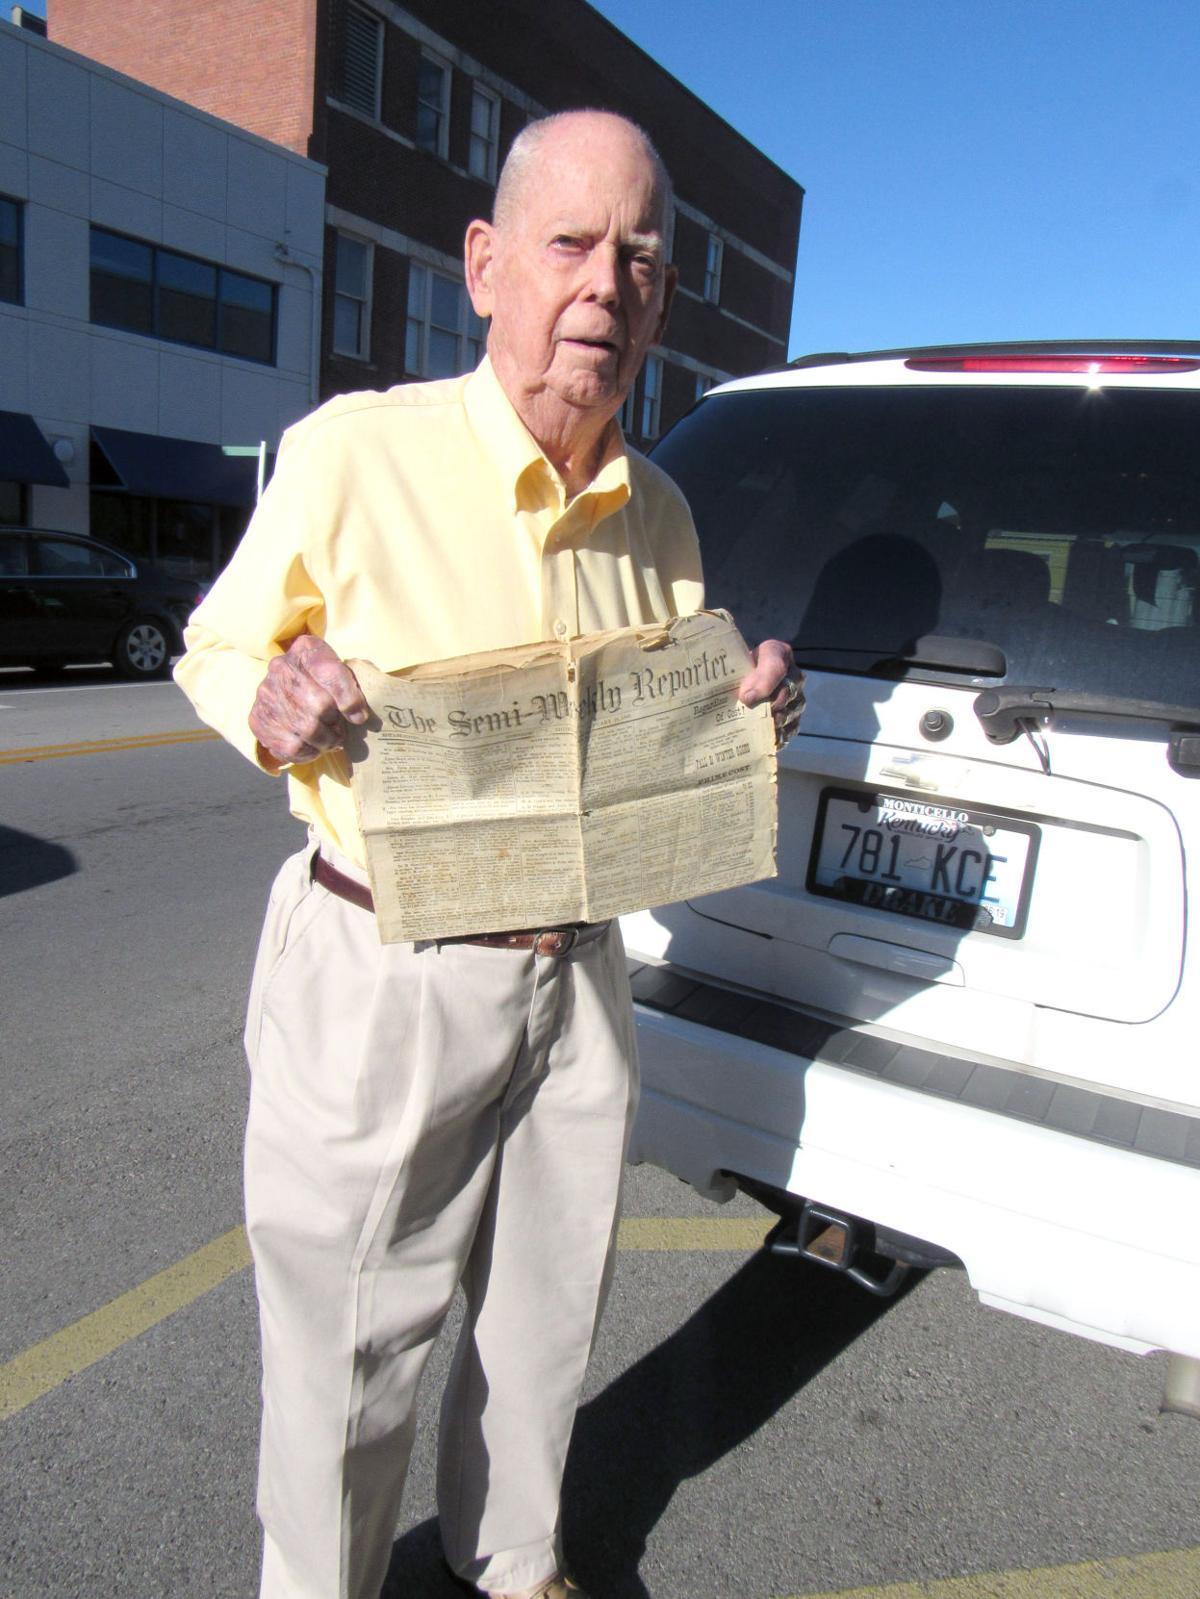 Male Newspaper Reporter